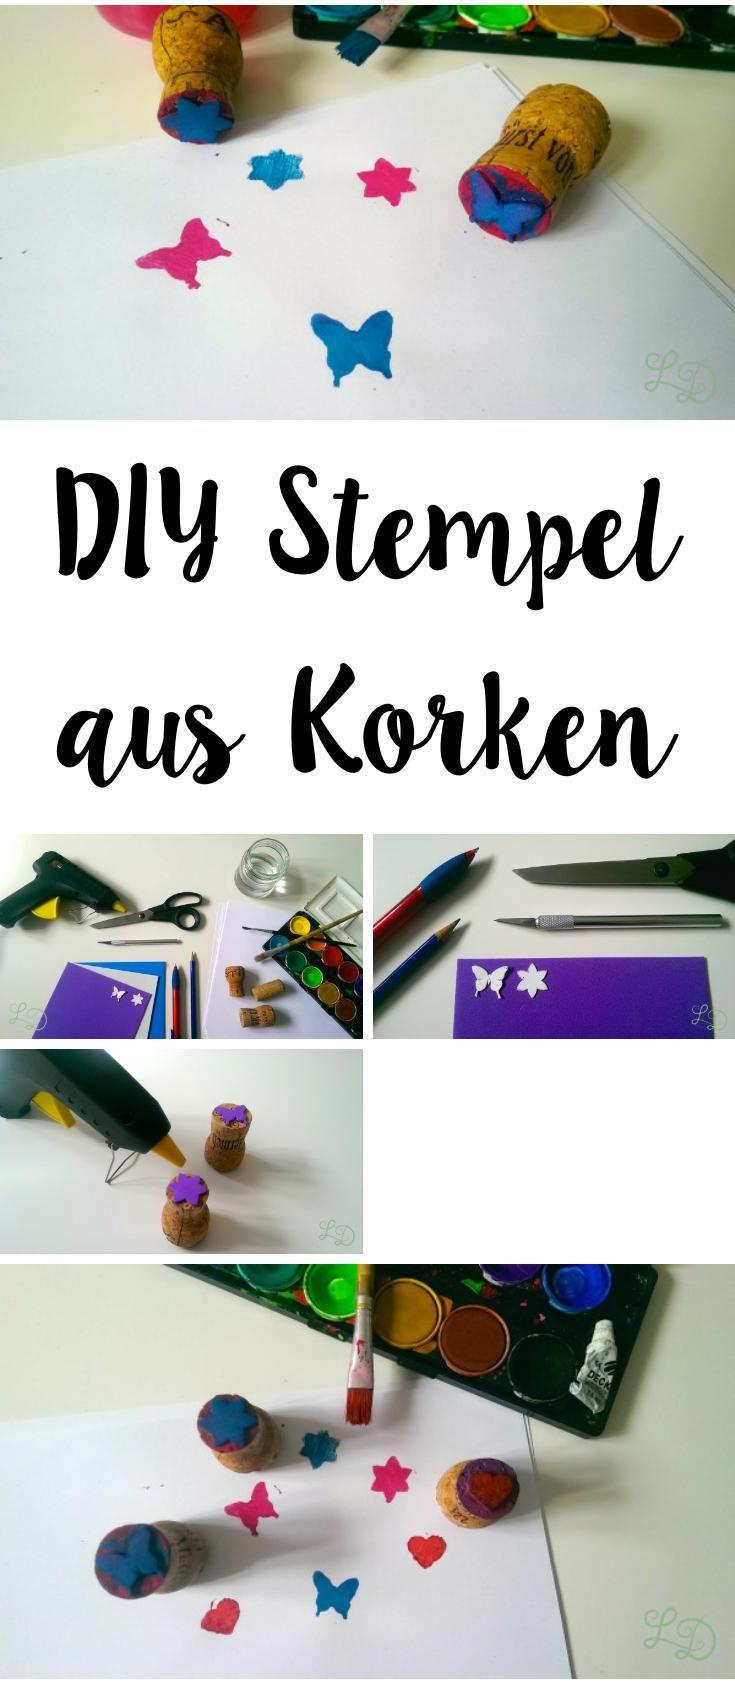 DIY Stamp made of Cork   DIY Stempel aus Kork